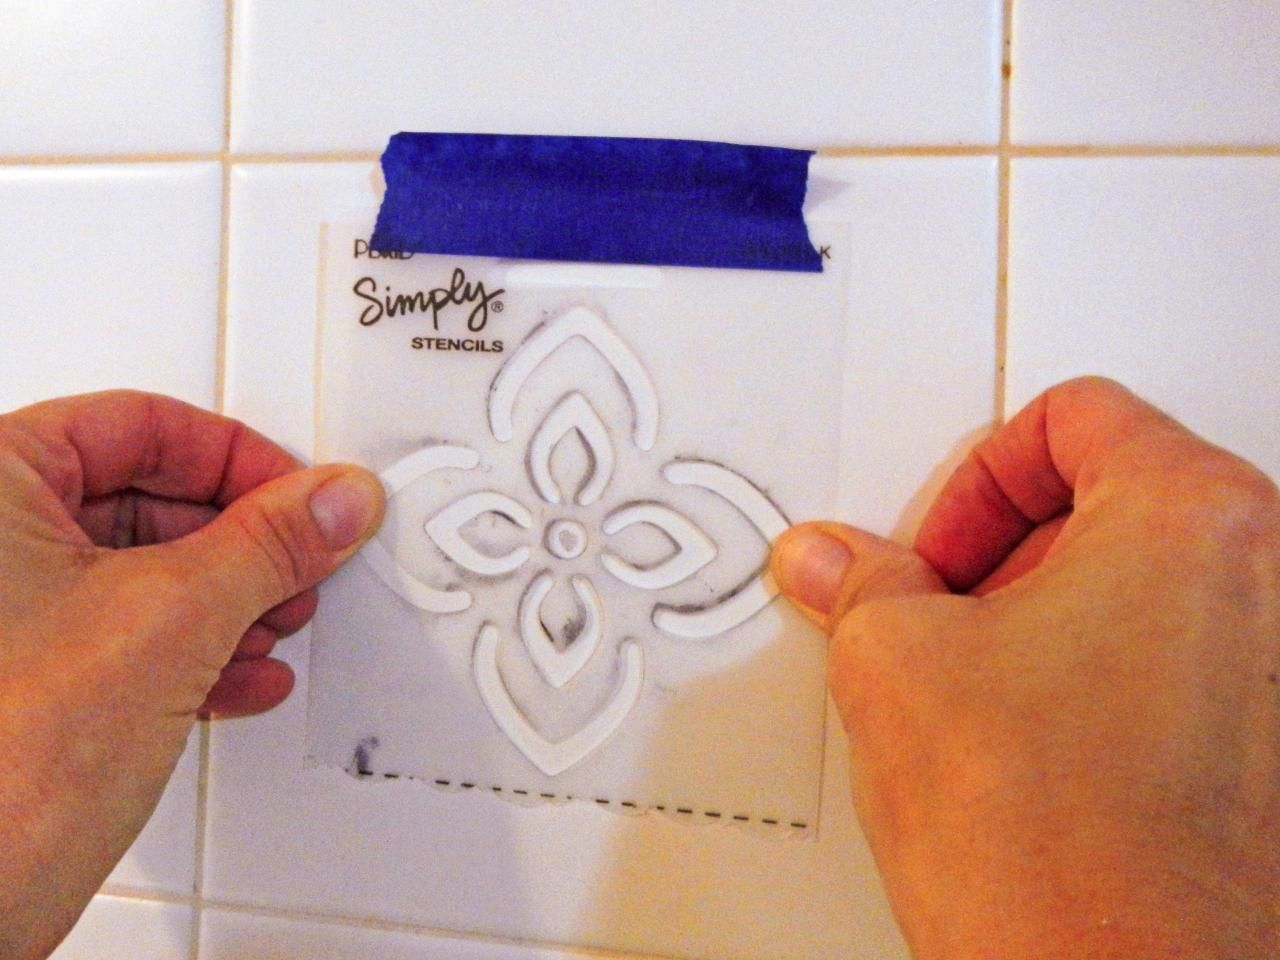 How to paint backsplash tile diy network moroccan and stenciling how to paint backsplash tile dailygadgetfo Choice Image